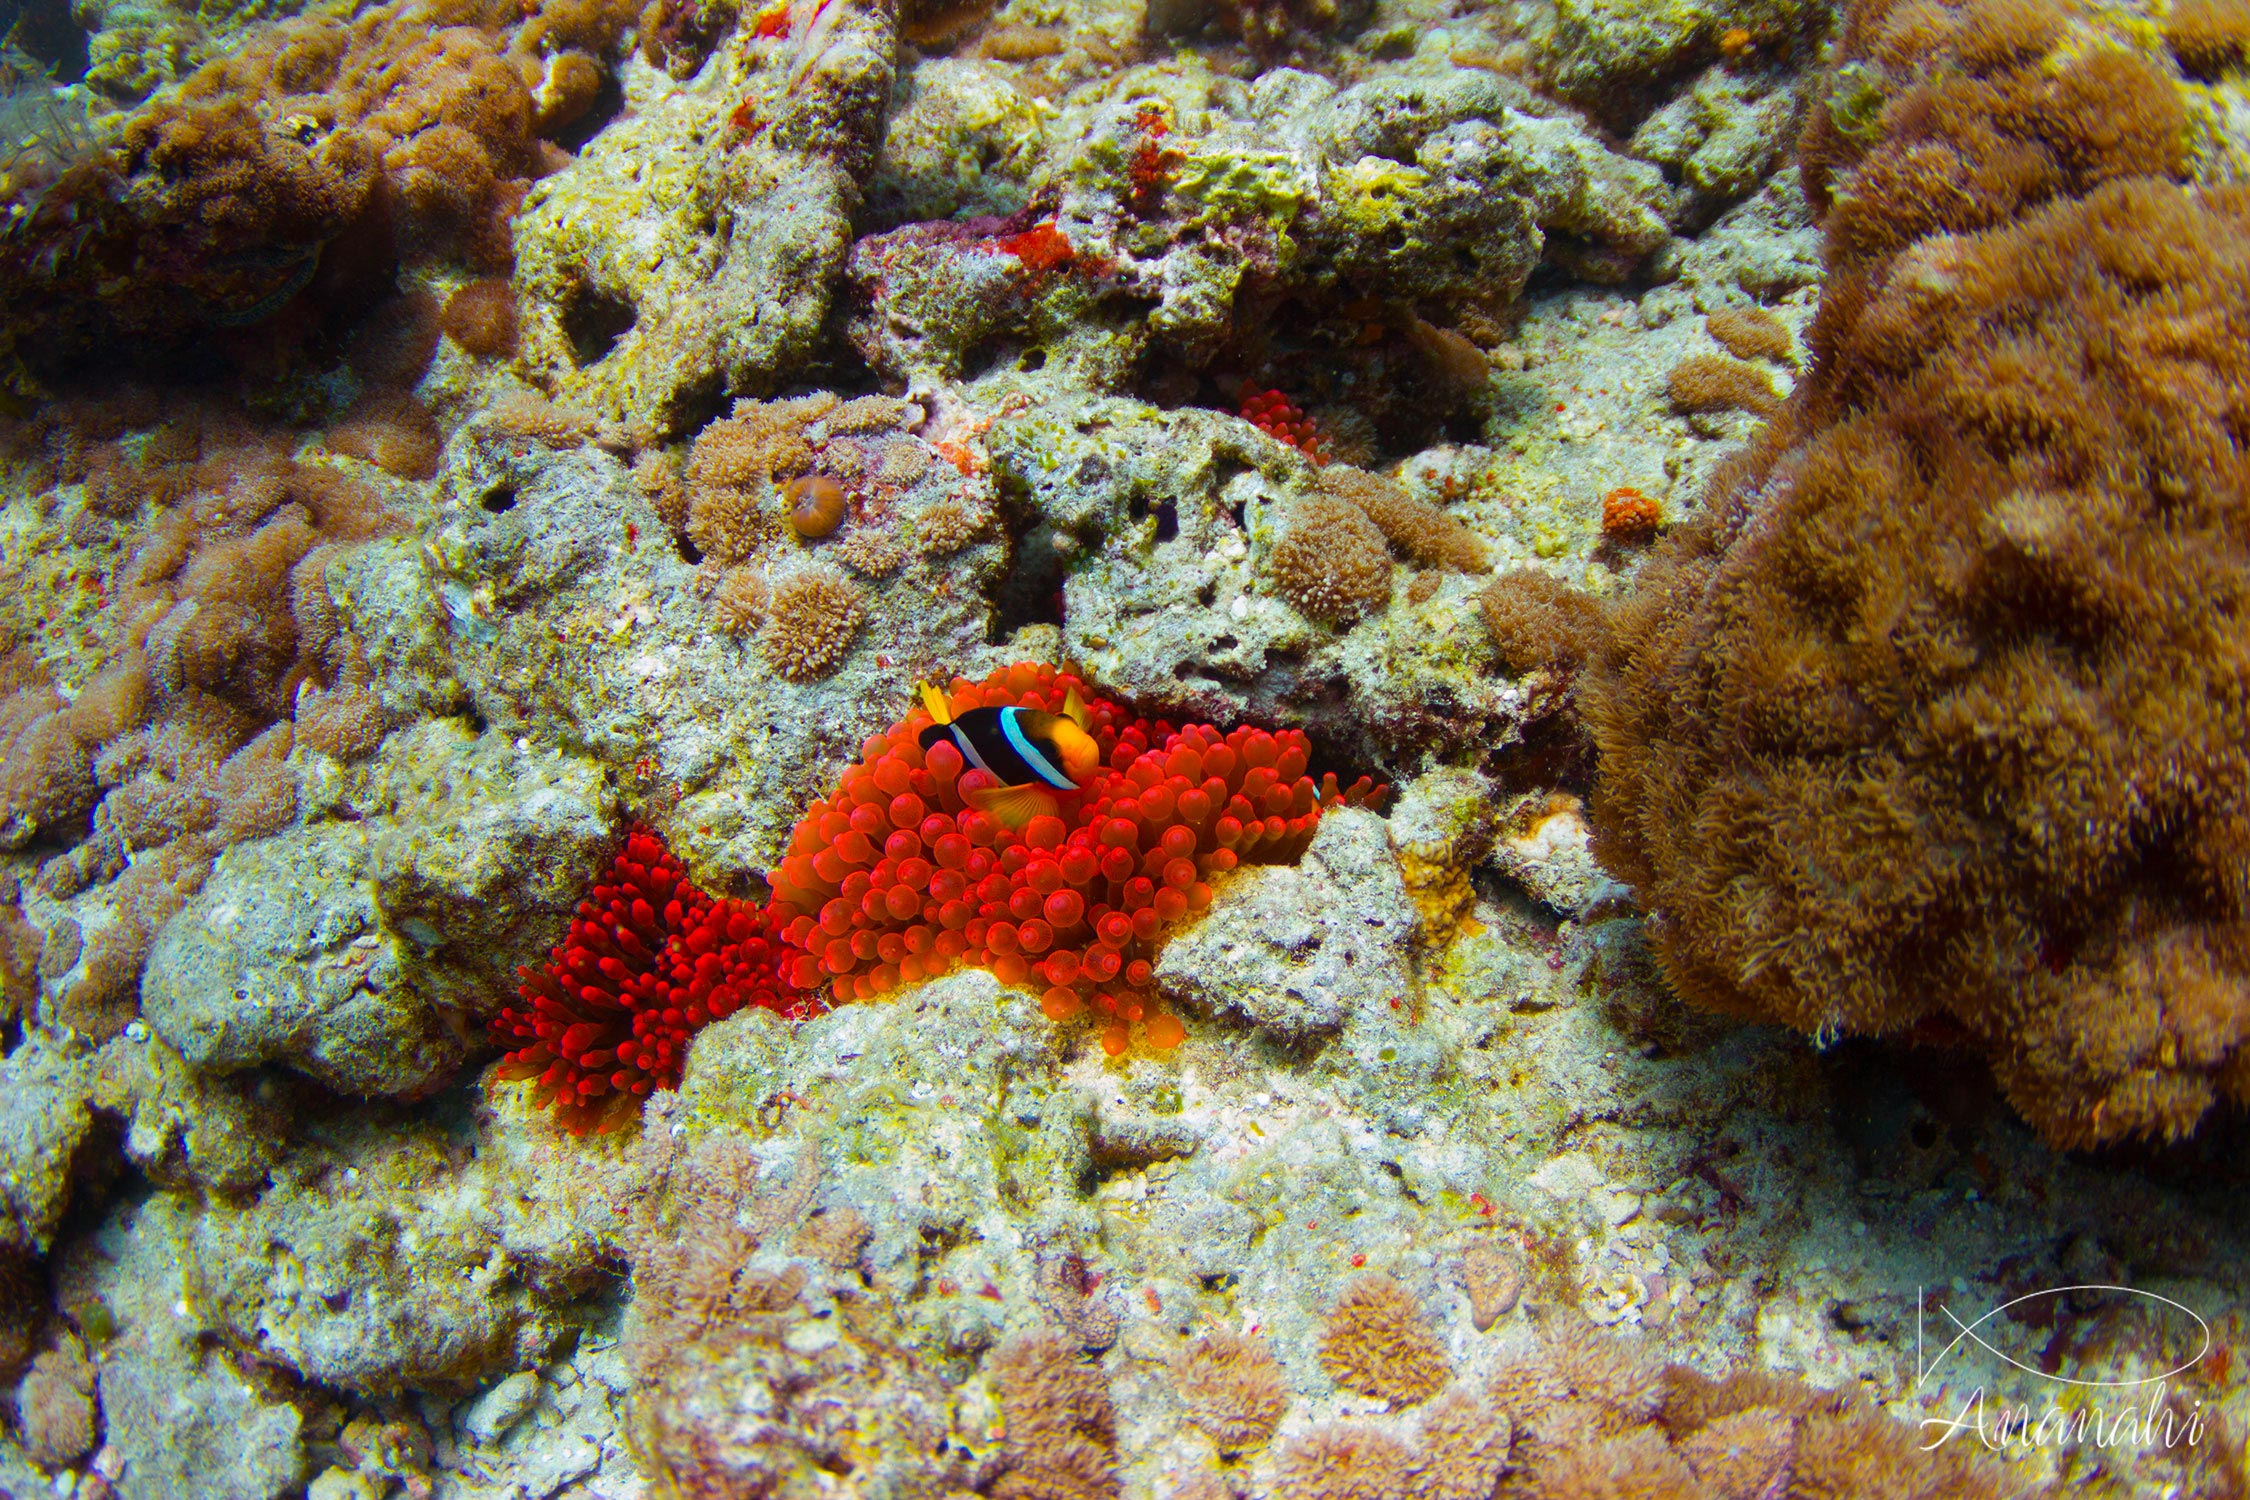 Bulb-tentacle sea anemone of Maldives